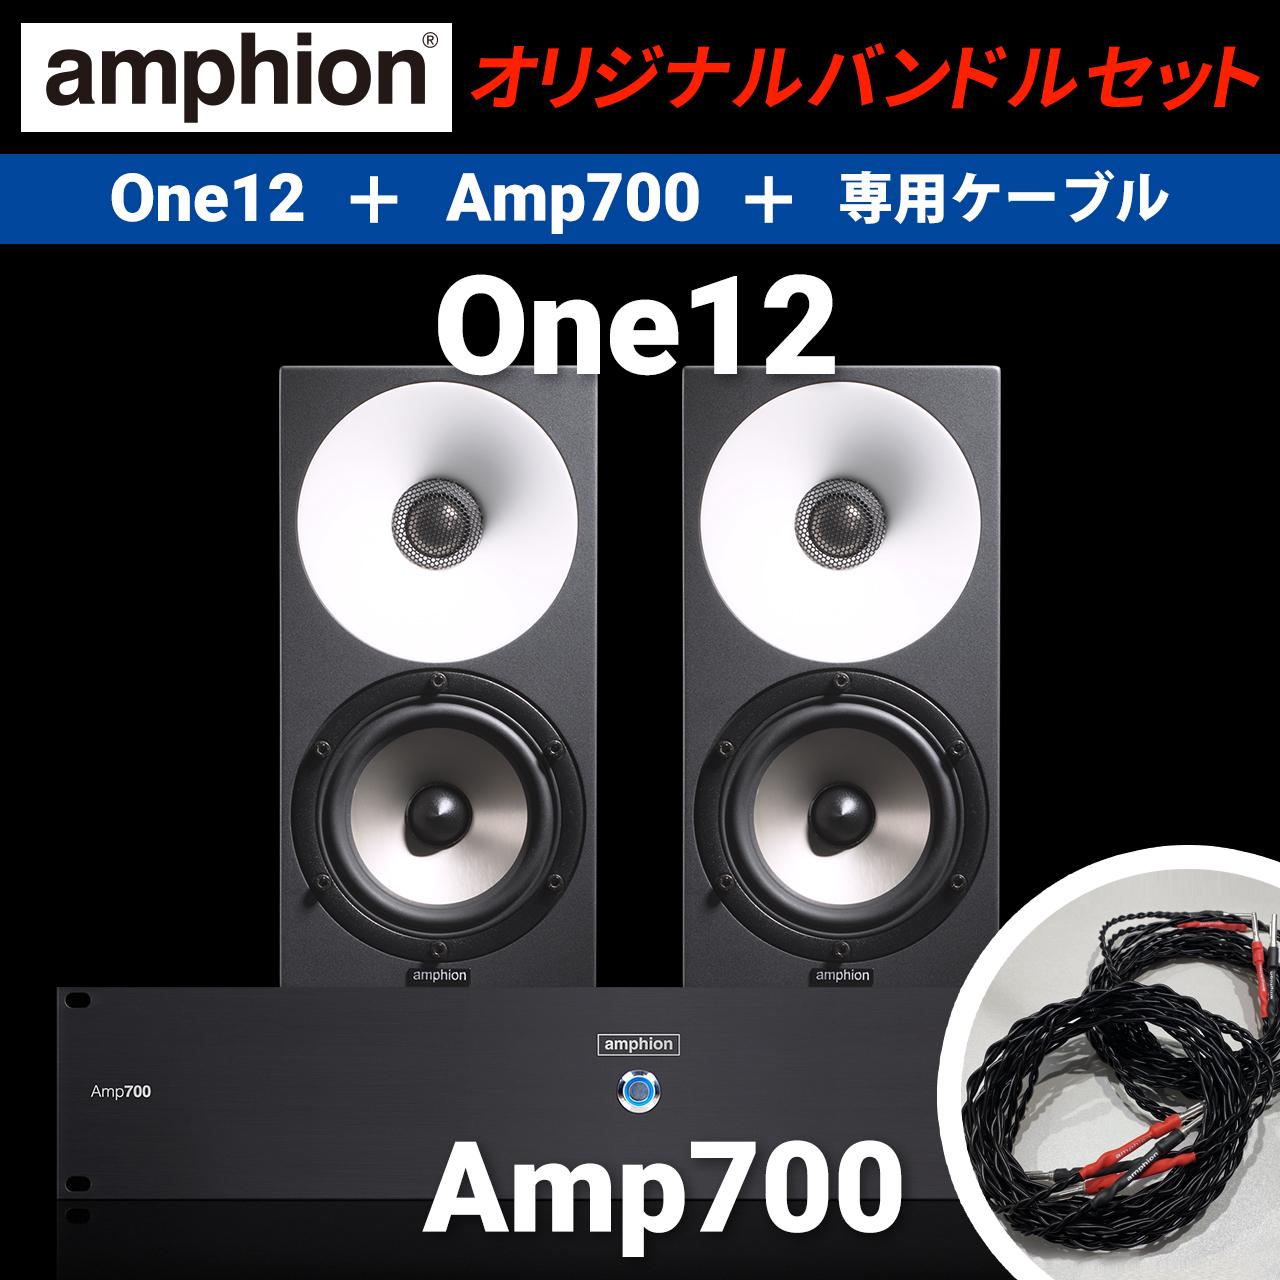 One12 + Amp700+ スピーカー ケーブル バンドルセット